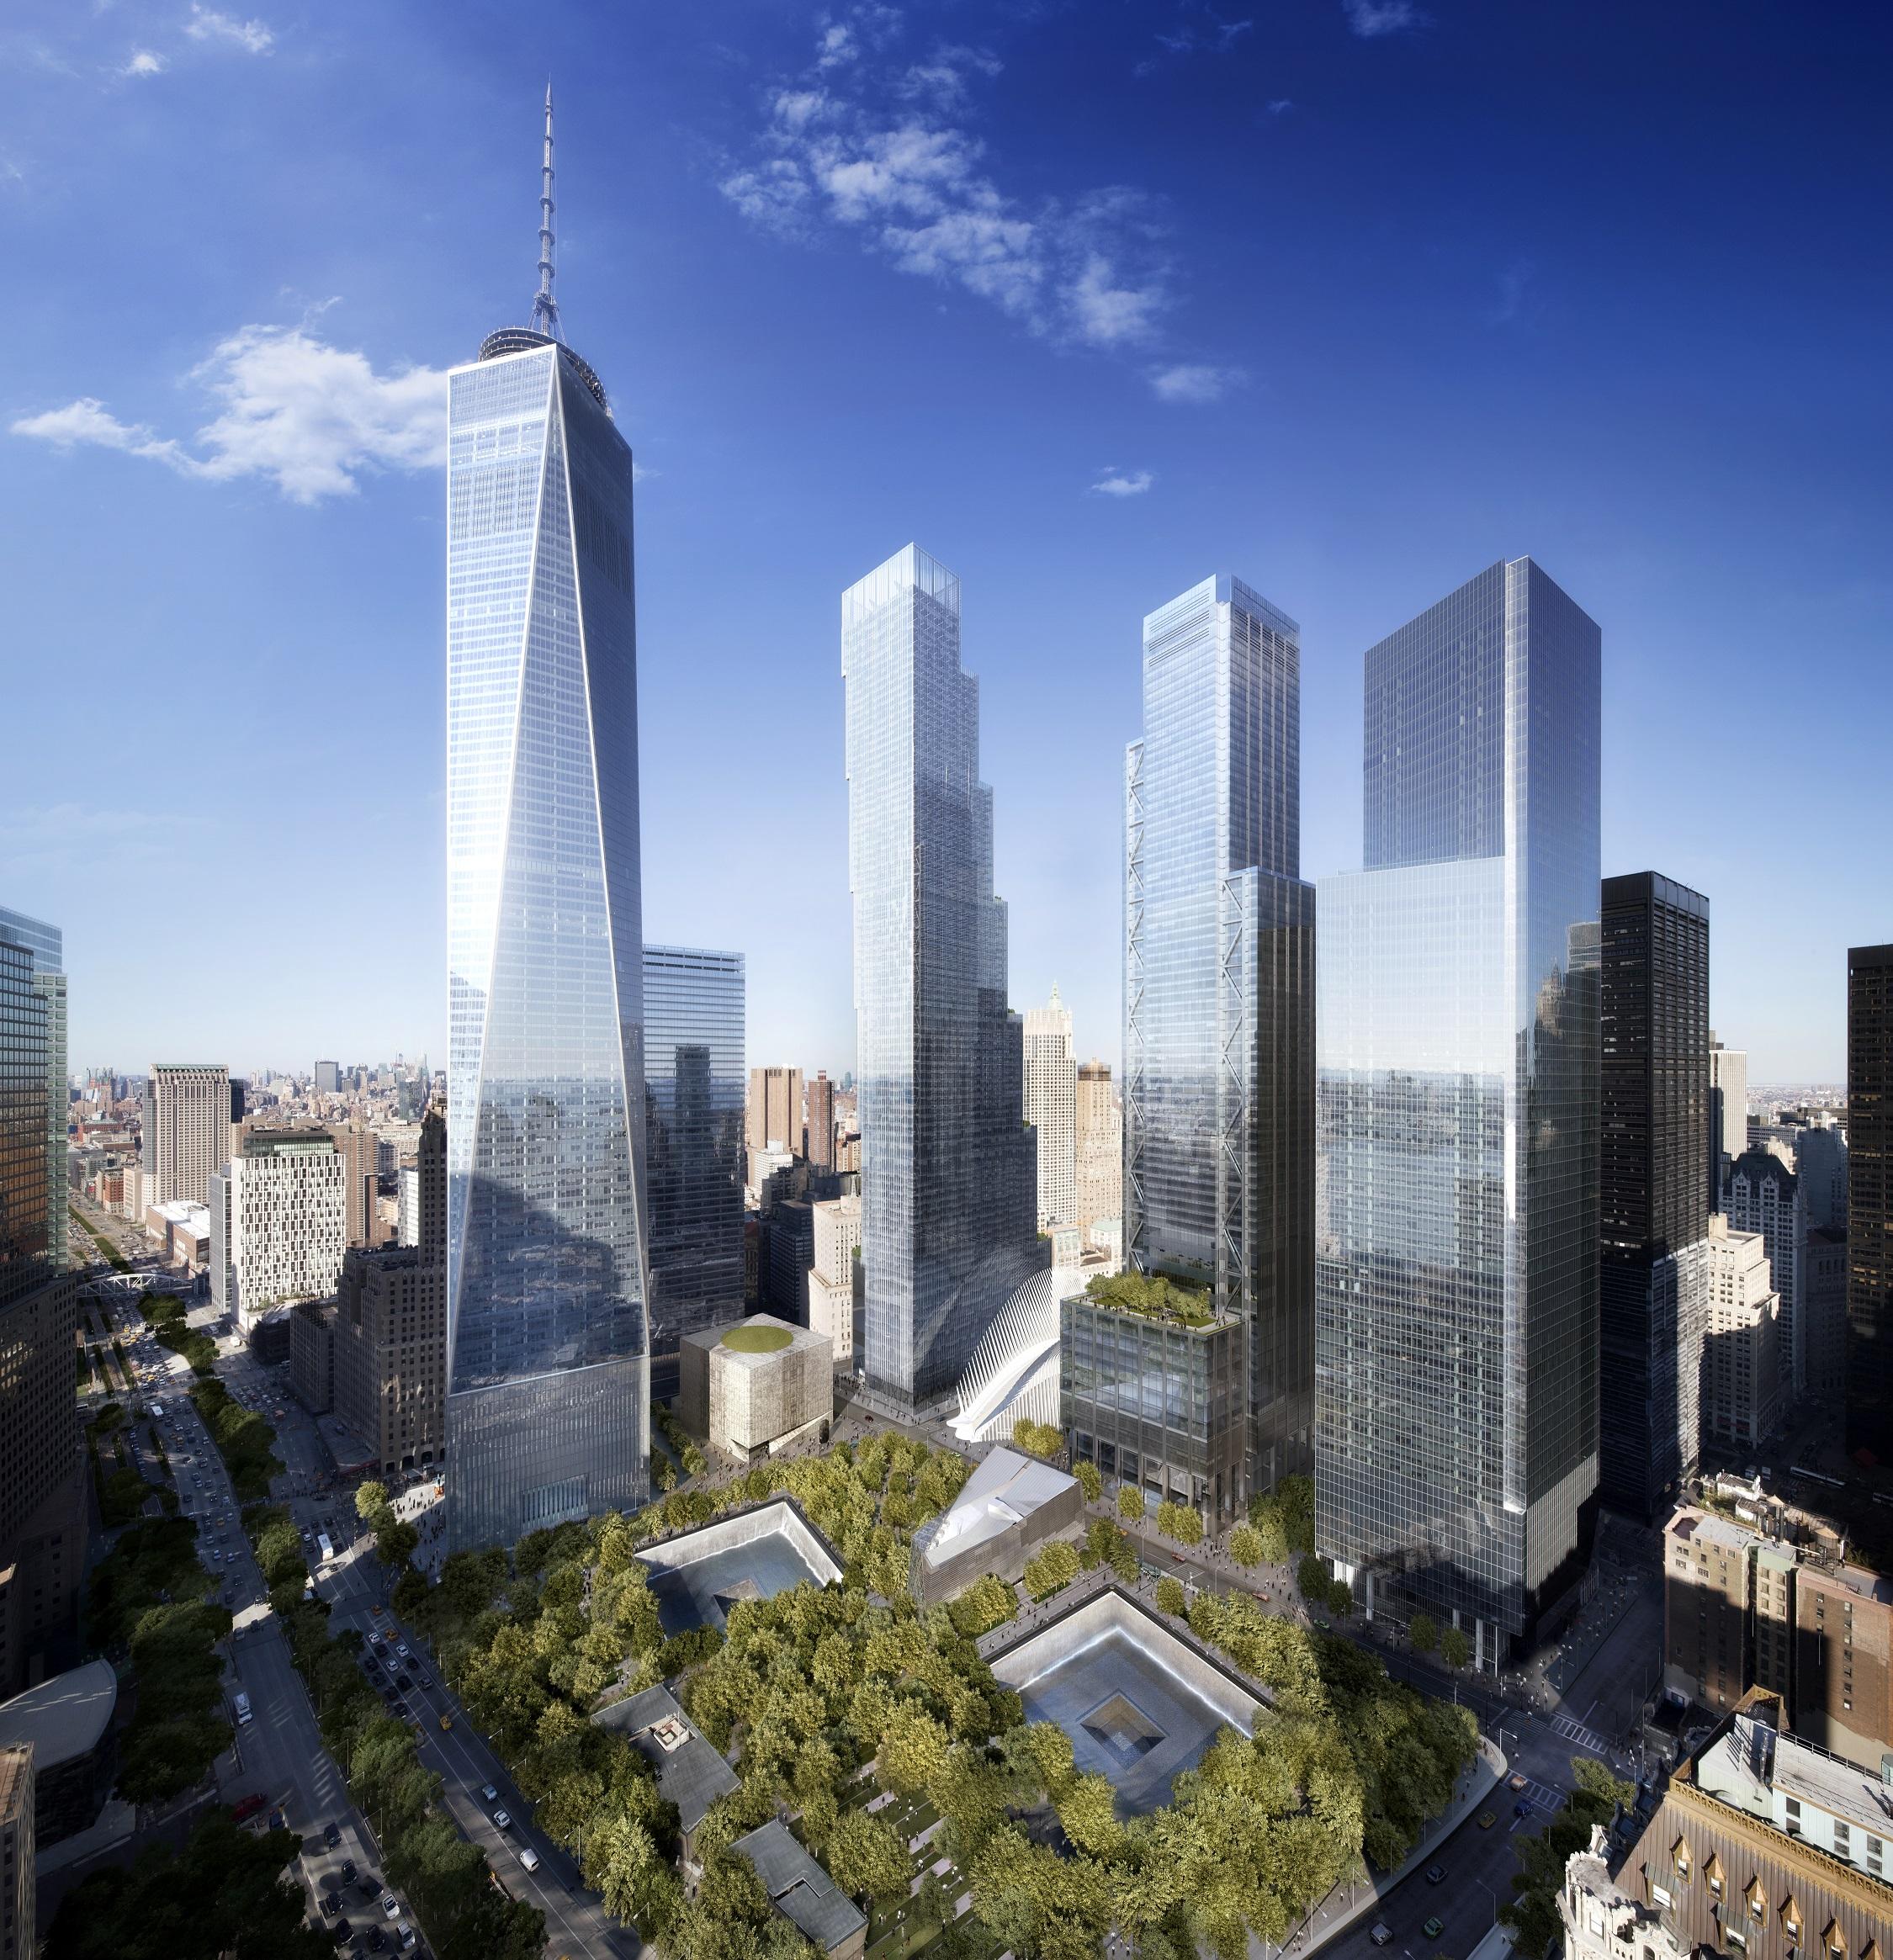 11 World Trade 9 Centers